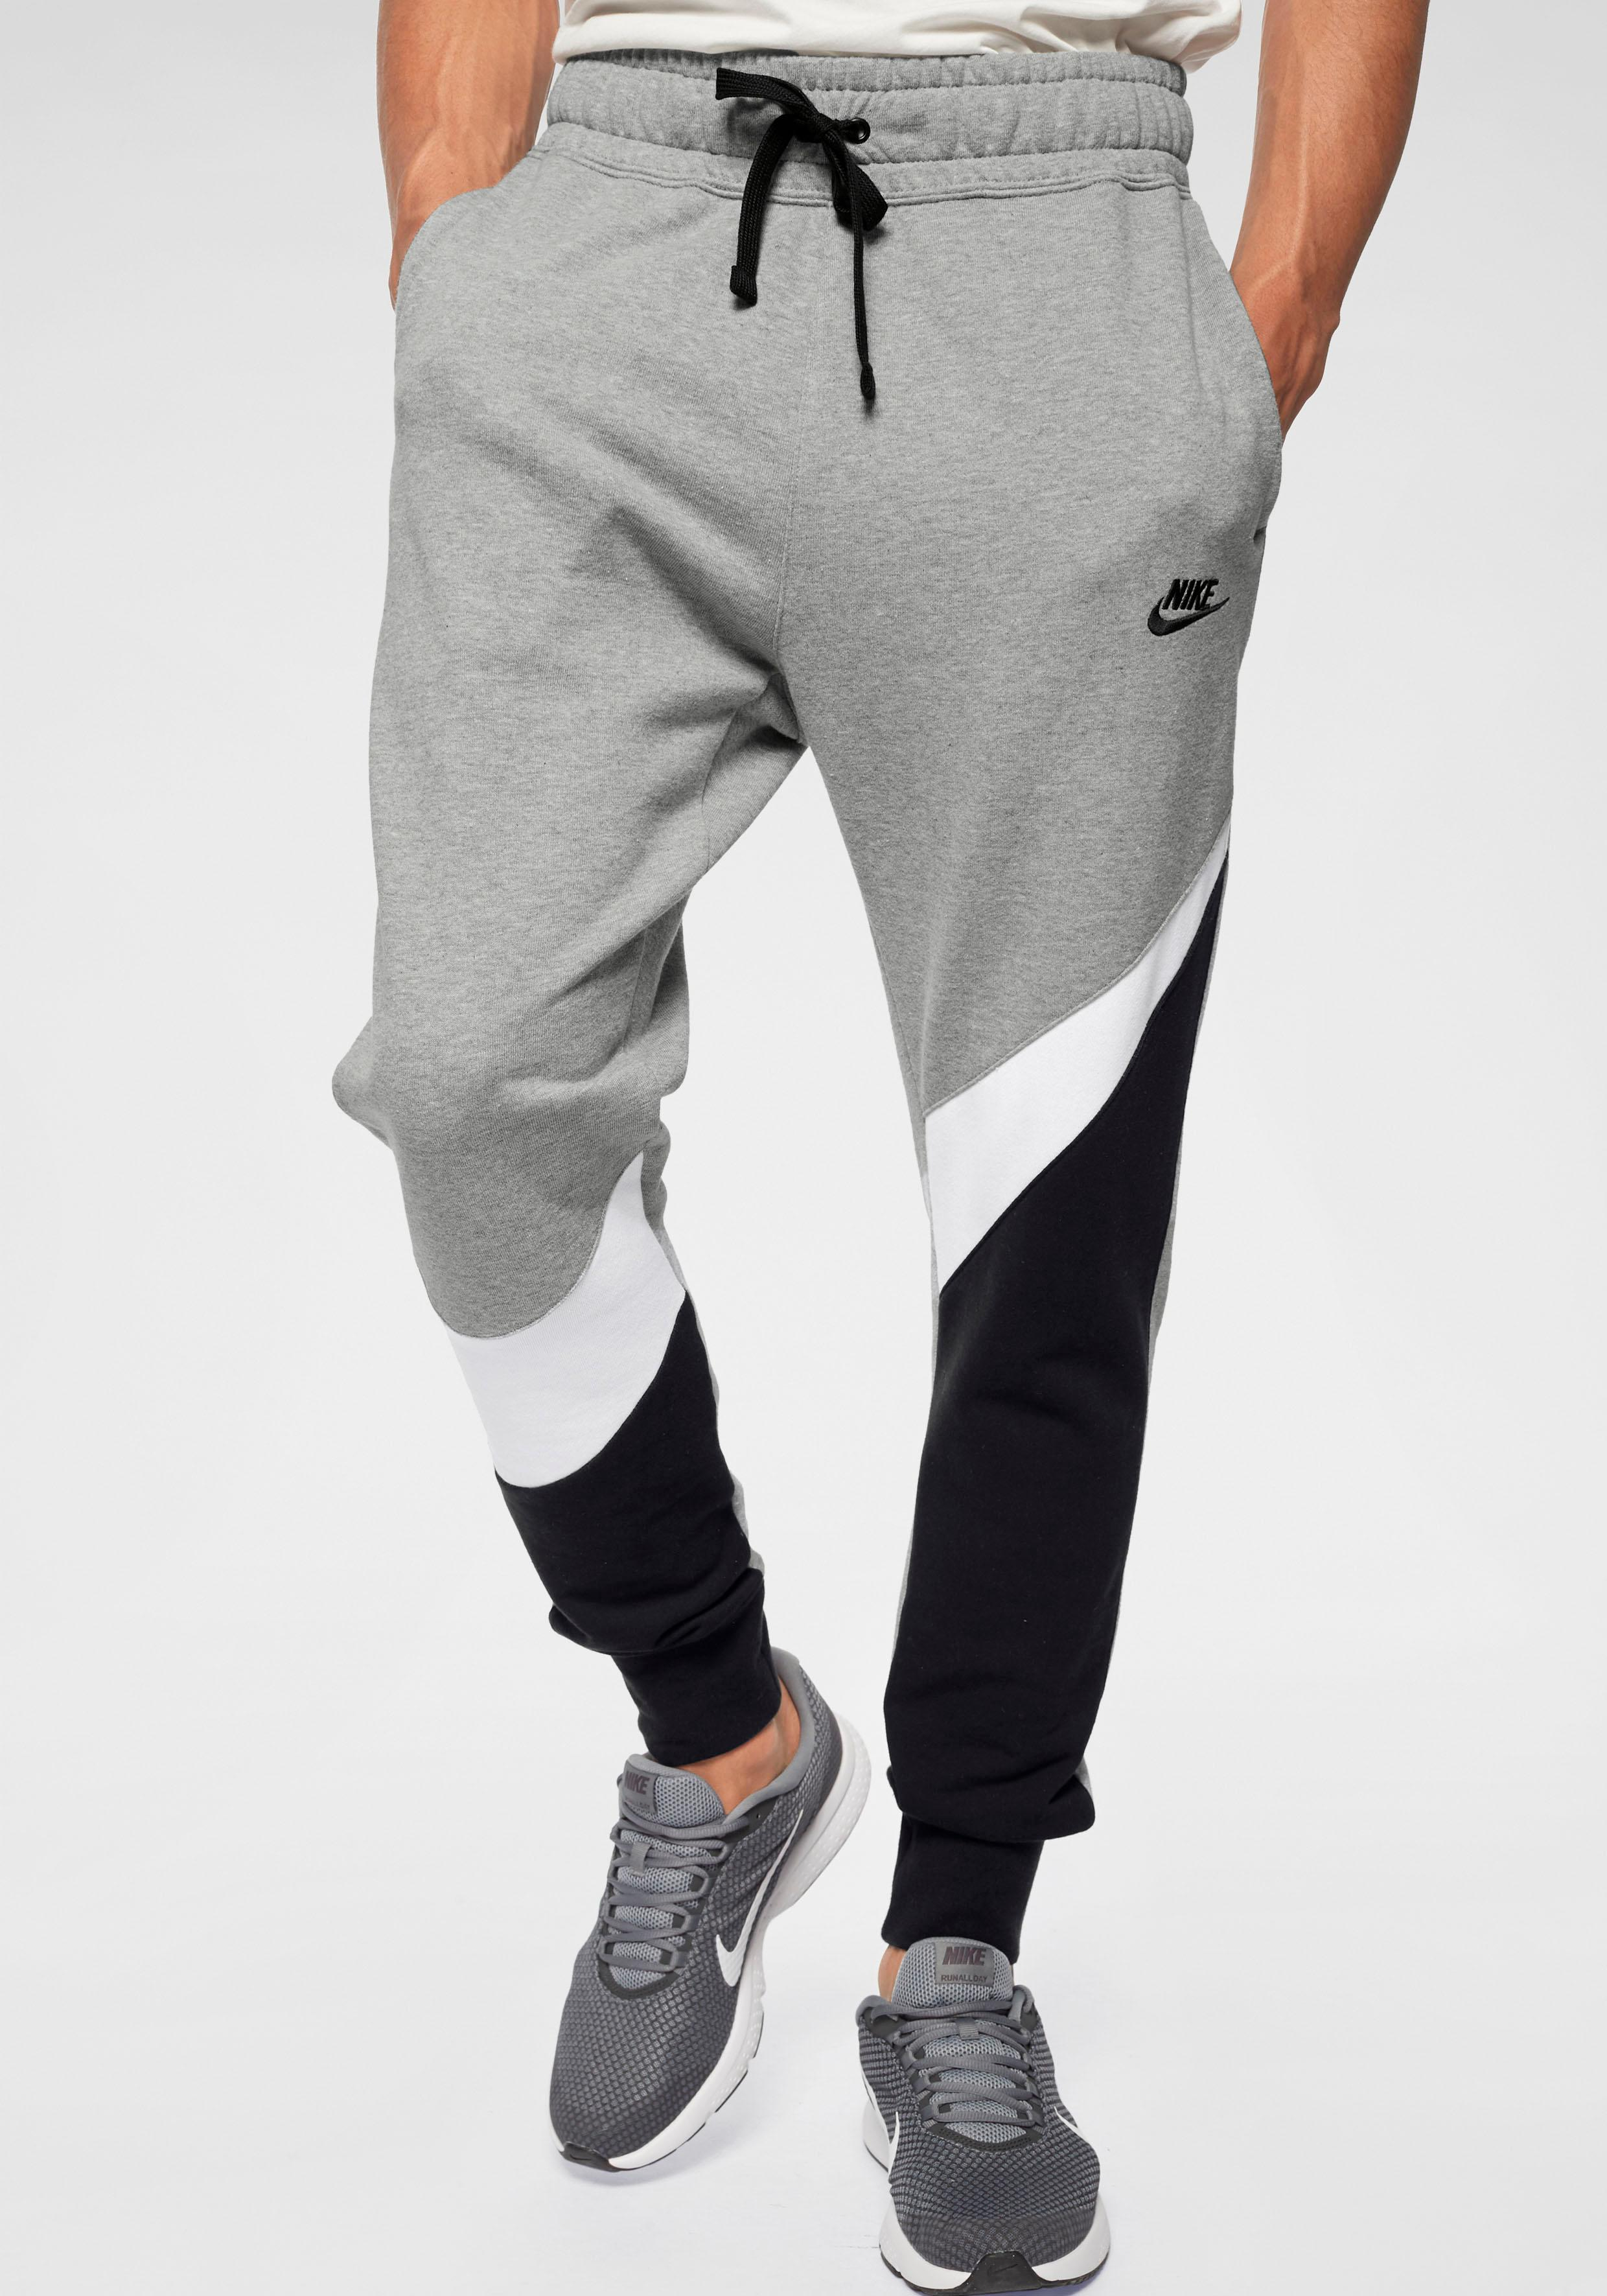 Nike Sportswear Jogginghose M NSW HBR PANT FT STMT | Sportbekleidung > Sporthosen | Grau | Nike Sportswear